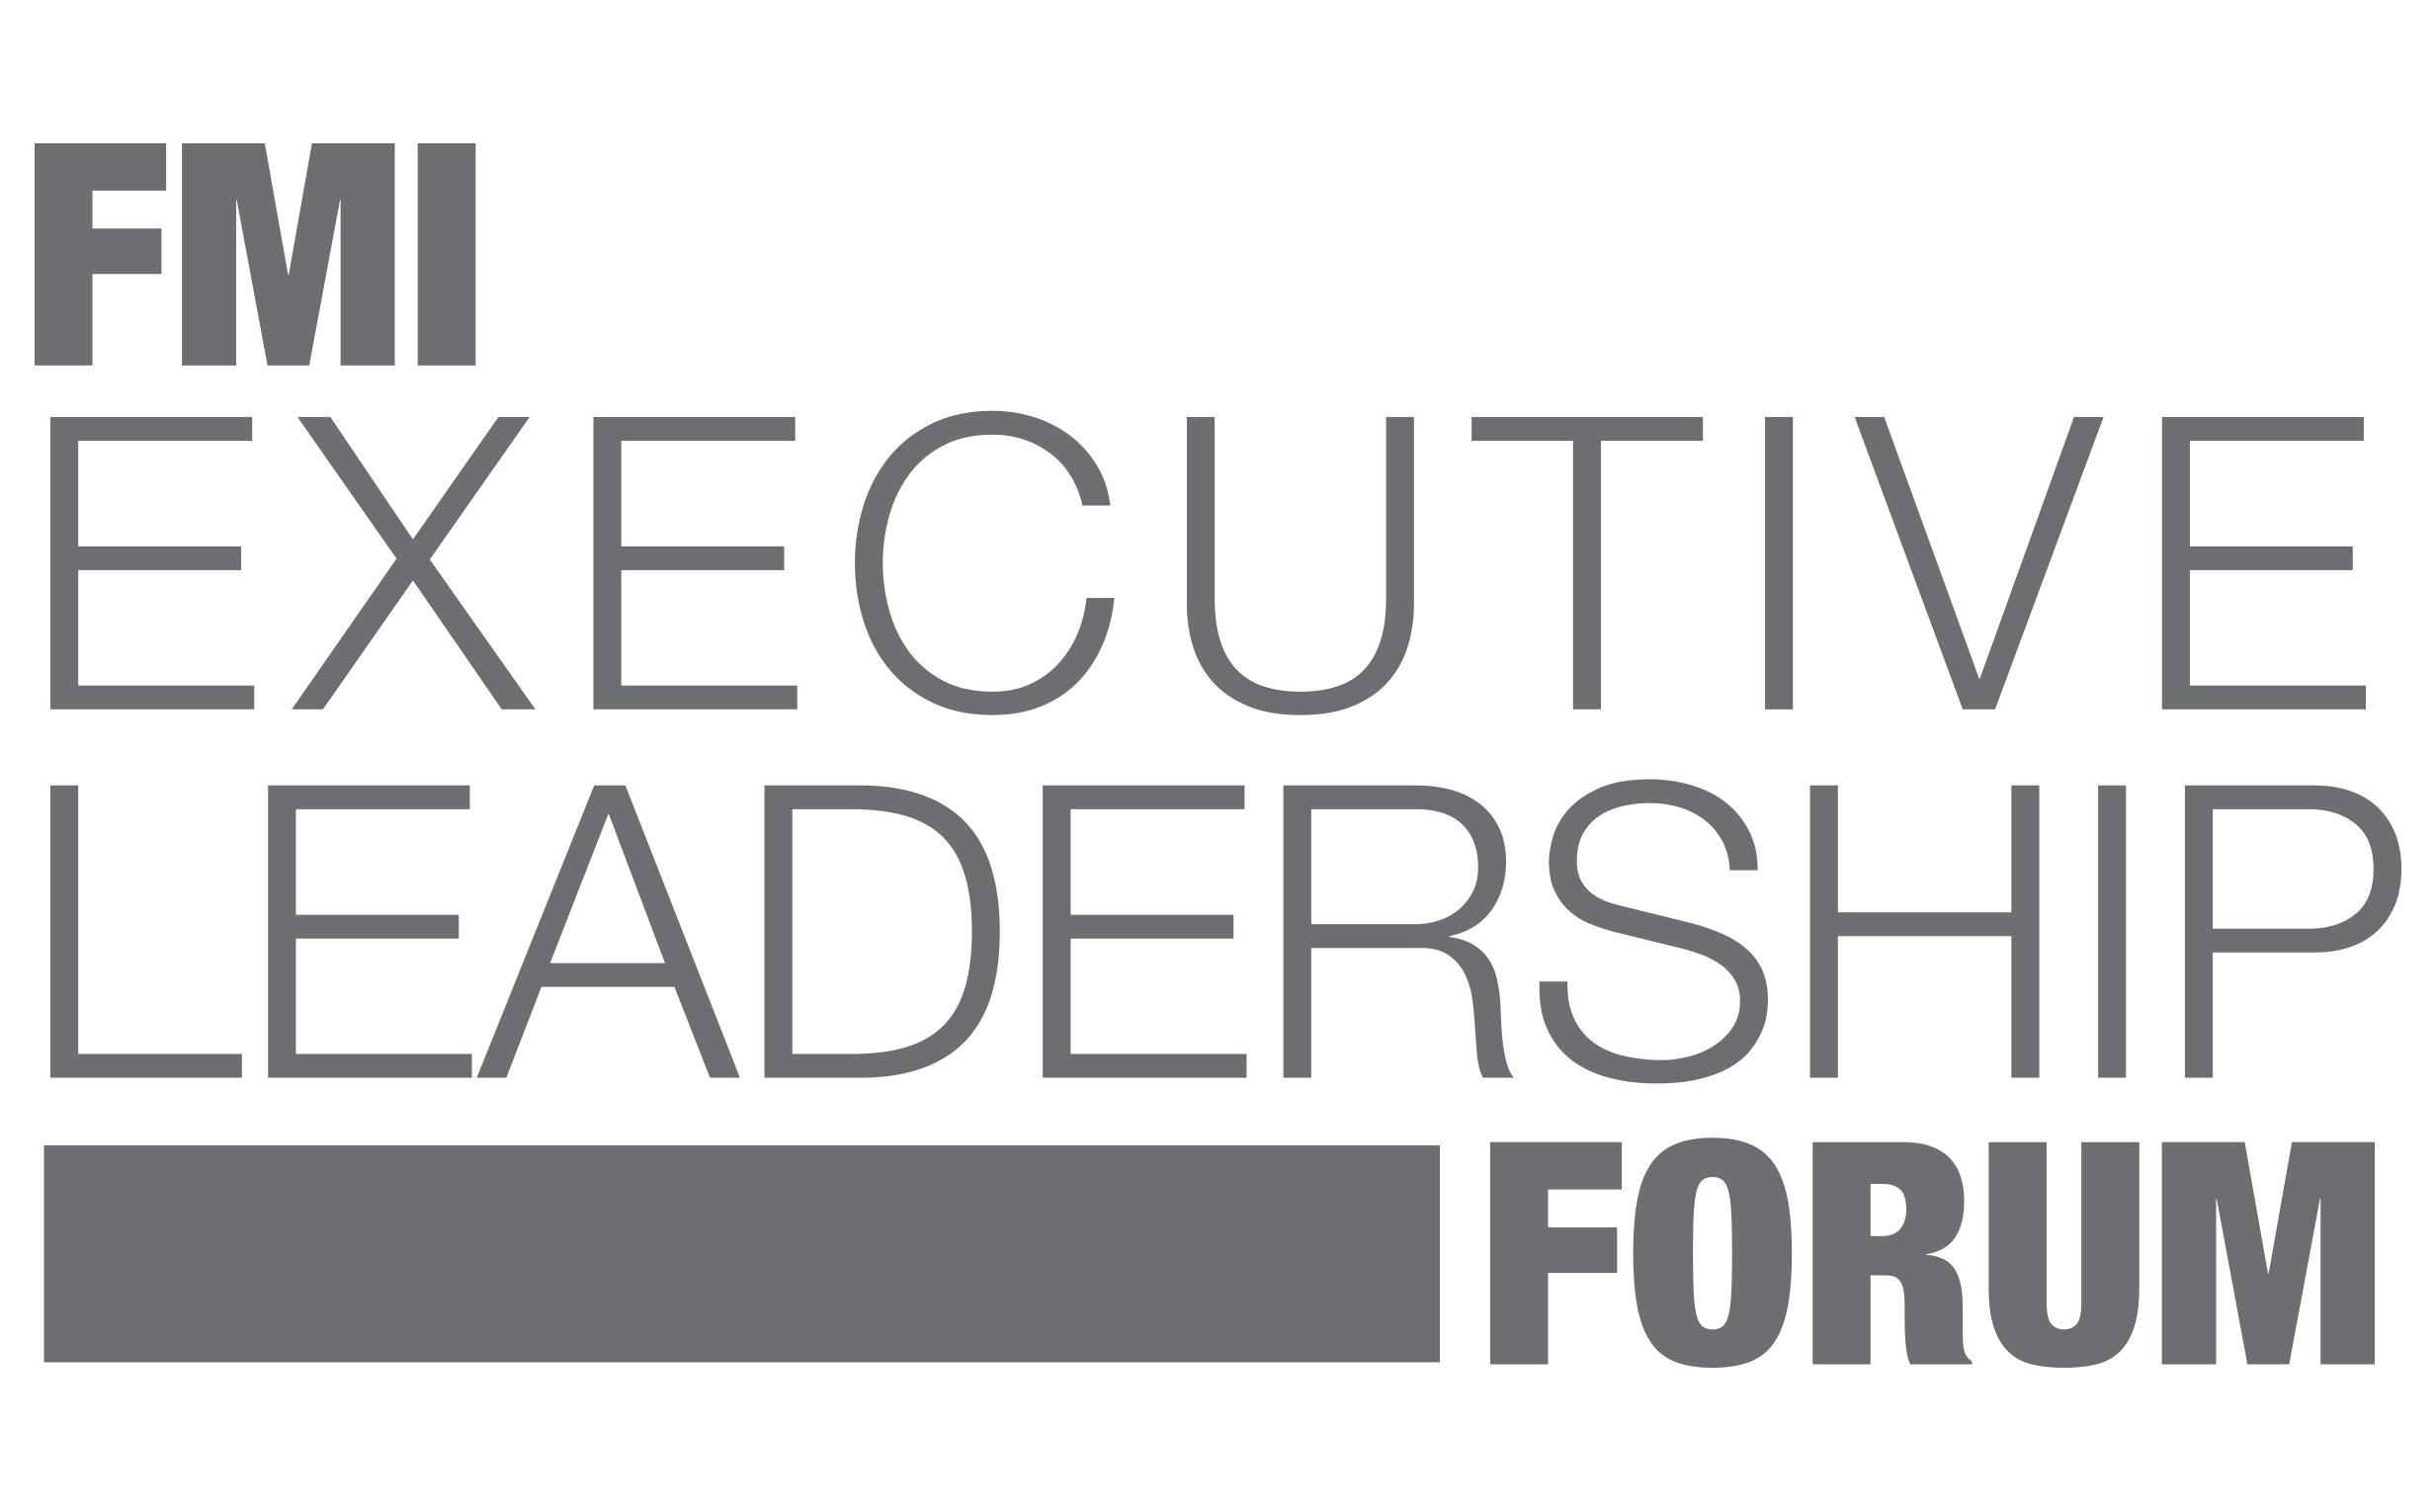 FMI 2017 Executive Leadership Forum - June 13, 2017